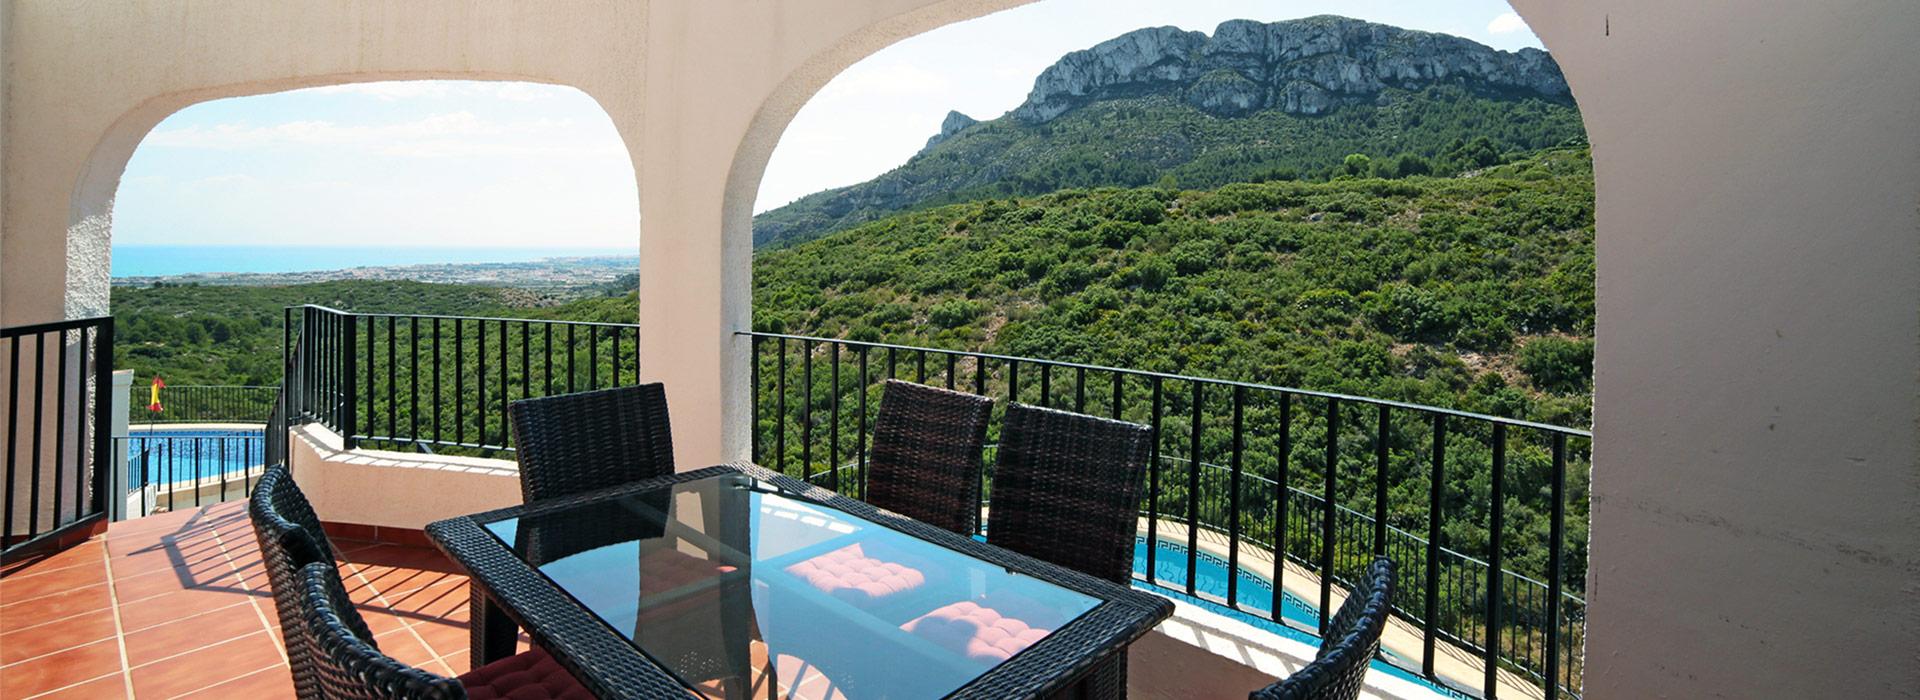 acb.immo - Villa de 3 chambres avec piscine et vue mer à Monte Pego, Denia